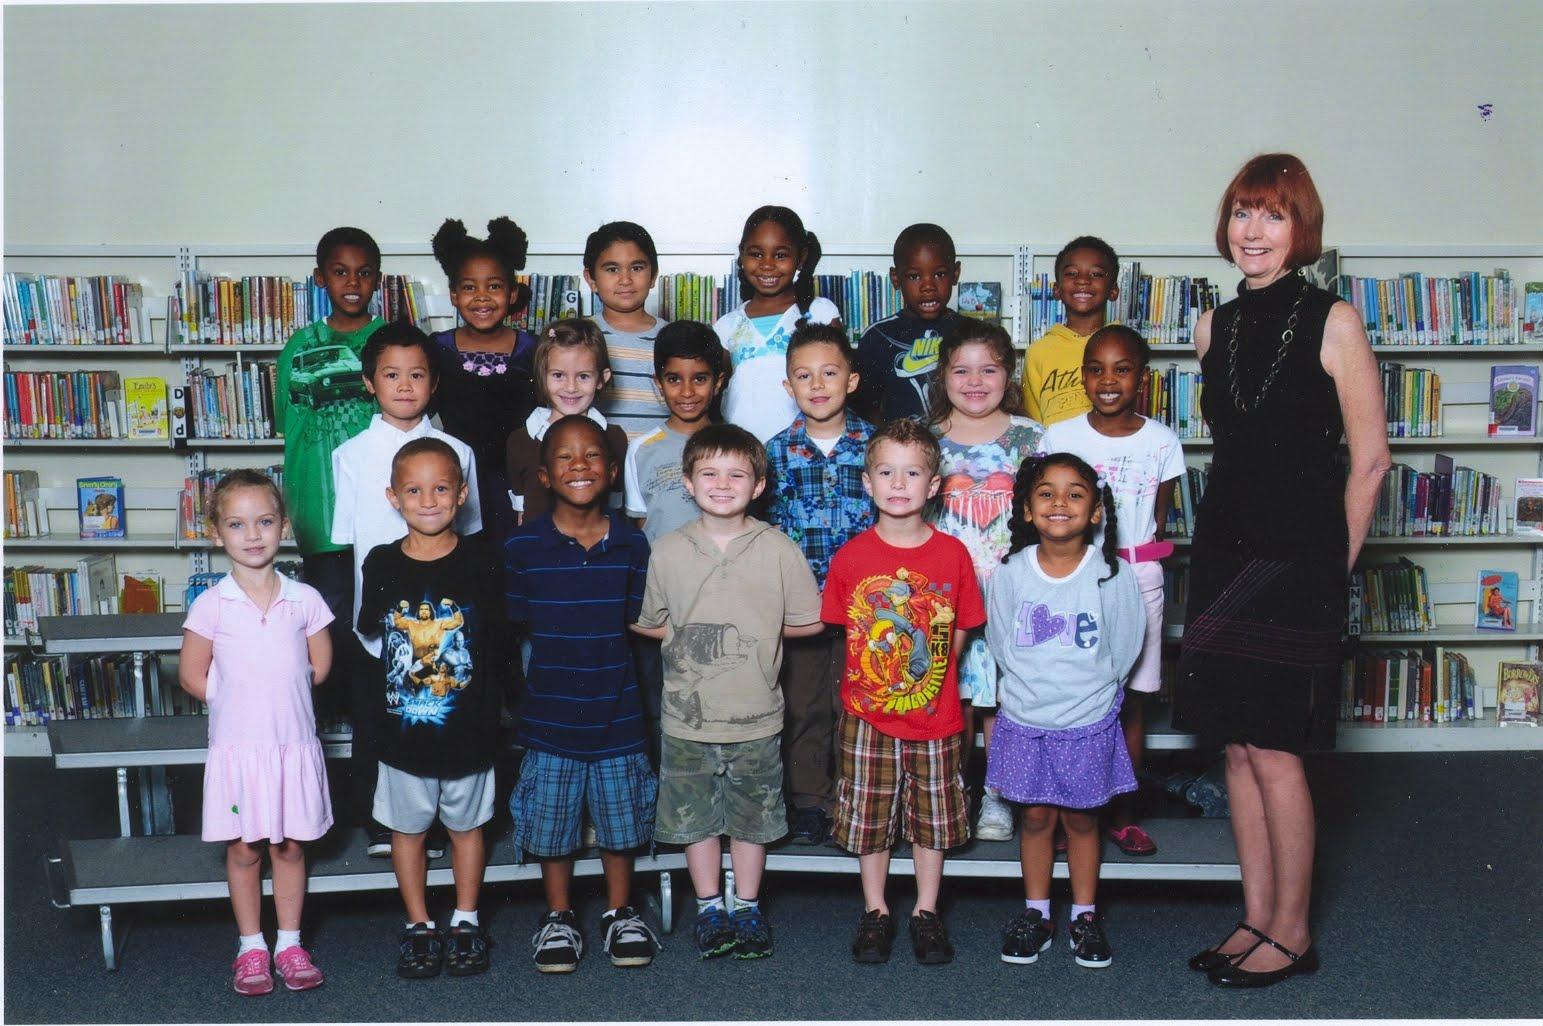 http://3.bp.blogspot.com/_AWNUSdt5UfA/TA6mfv8gcZI/AAAAAAAAA9w/Enc6hiaI2Os/s1600/Erin%27s+Kindergarten+Class.jpg